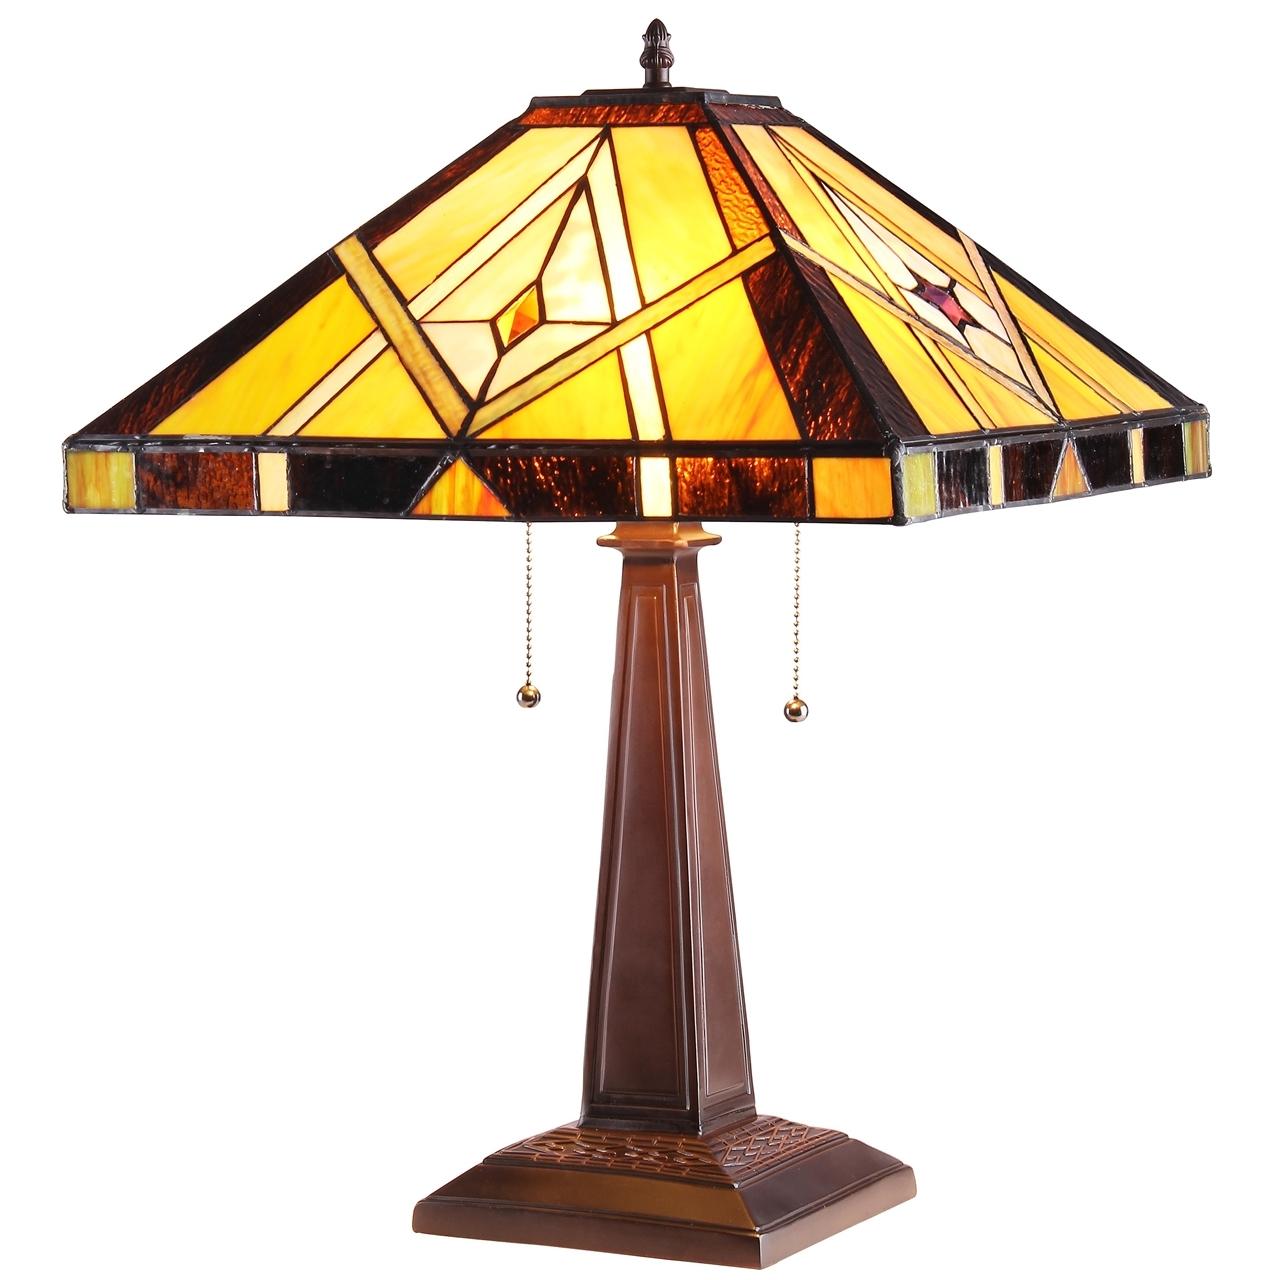 Wholesalers For Home Decor Chloe Lighting Inc Tiffany Lamp Tiffany Lamps Tiffany